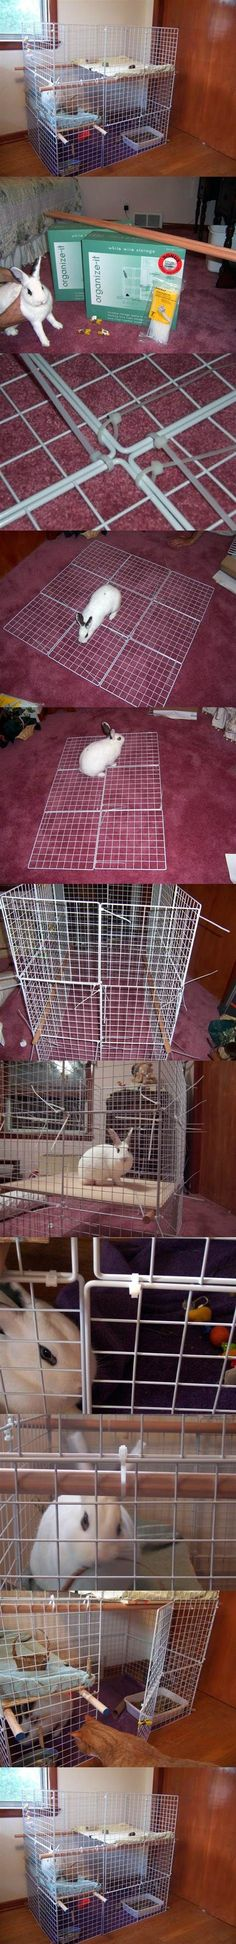 DIY Indoor 3-Level Rabbit Condo 2